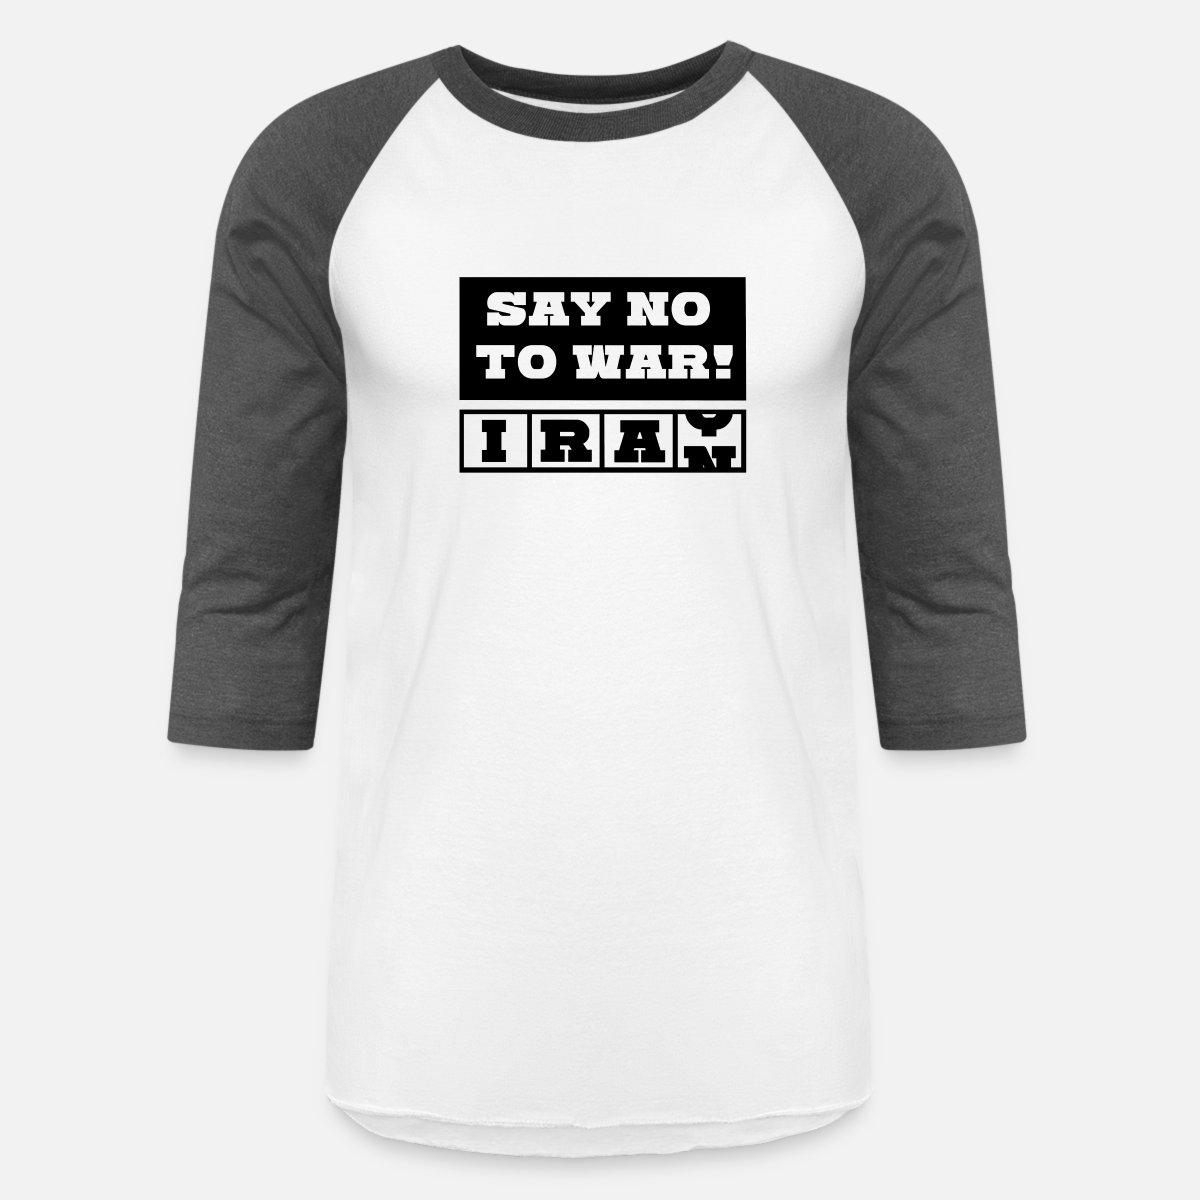 f84a8eb701 Best T Shirts Sayings | Top Mode Depot